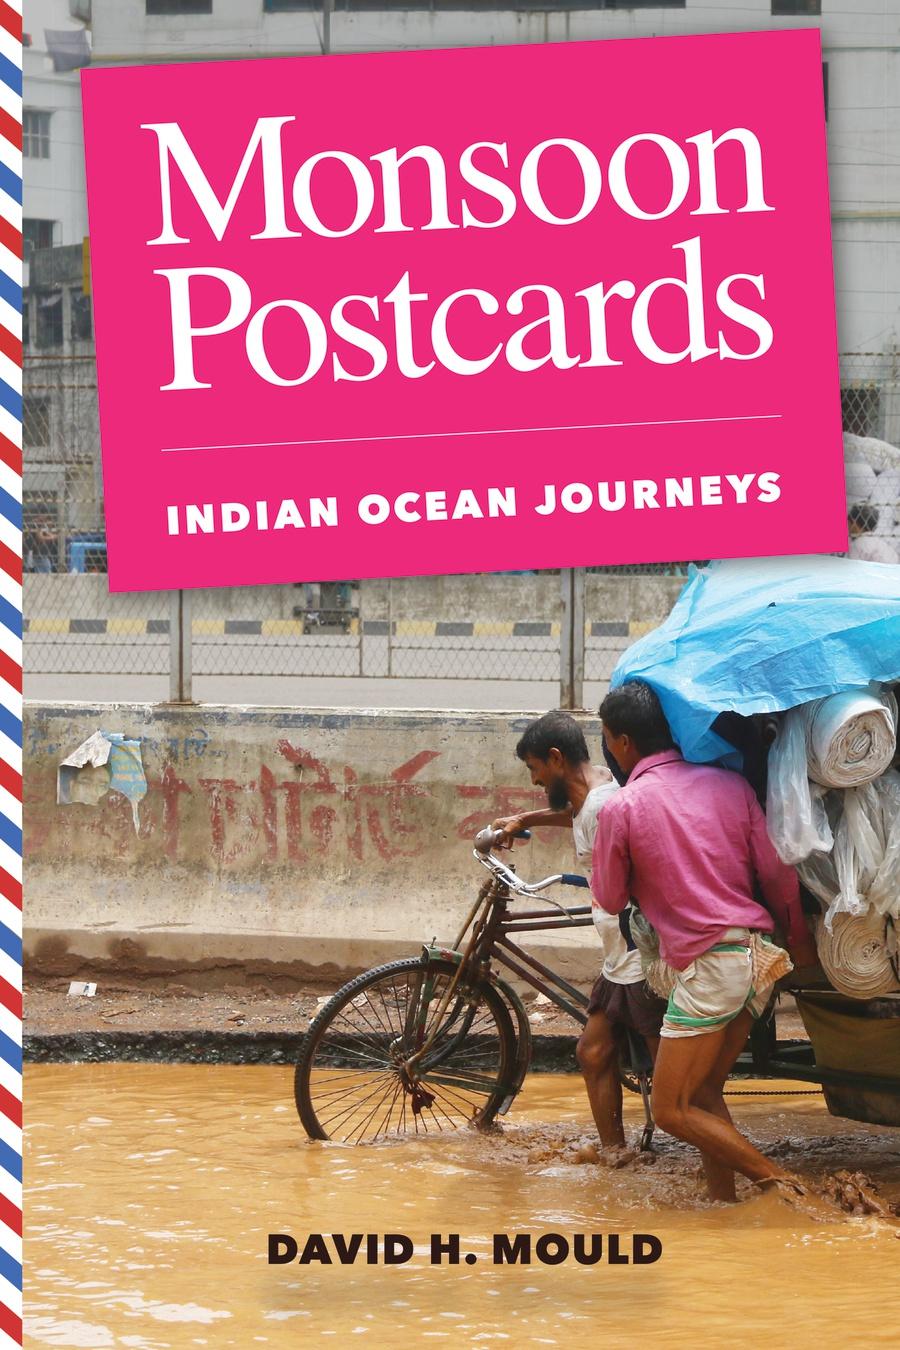 Monsoon Postcards cover image.jpg